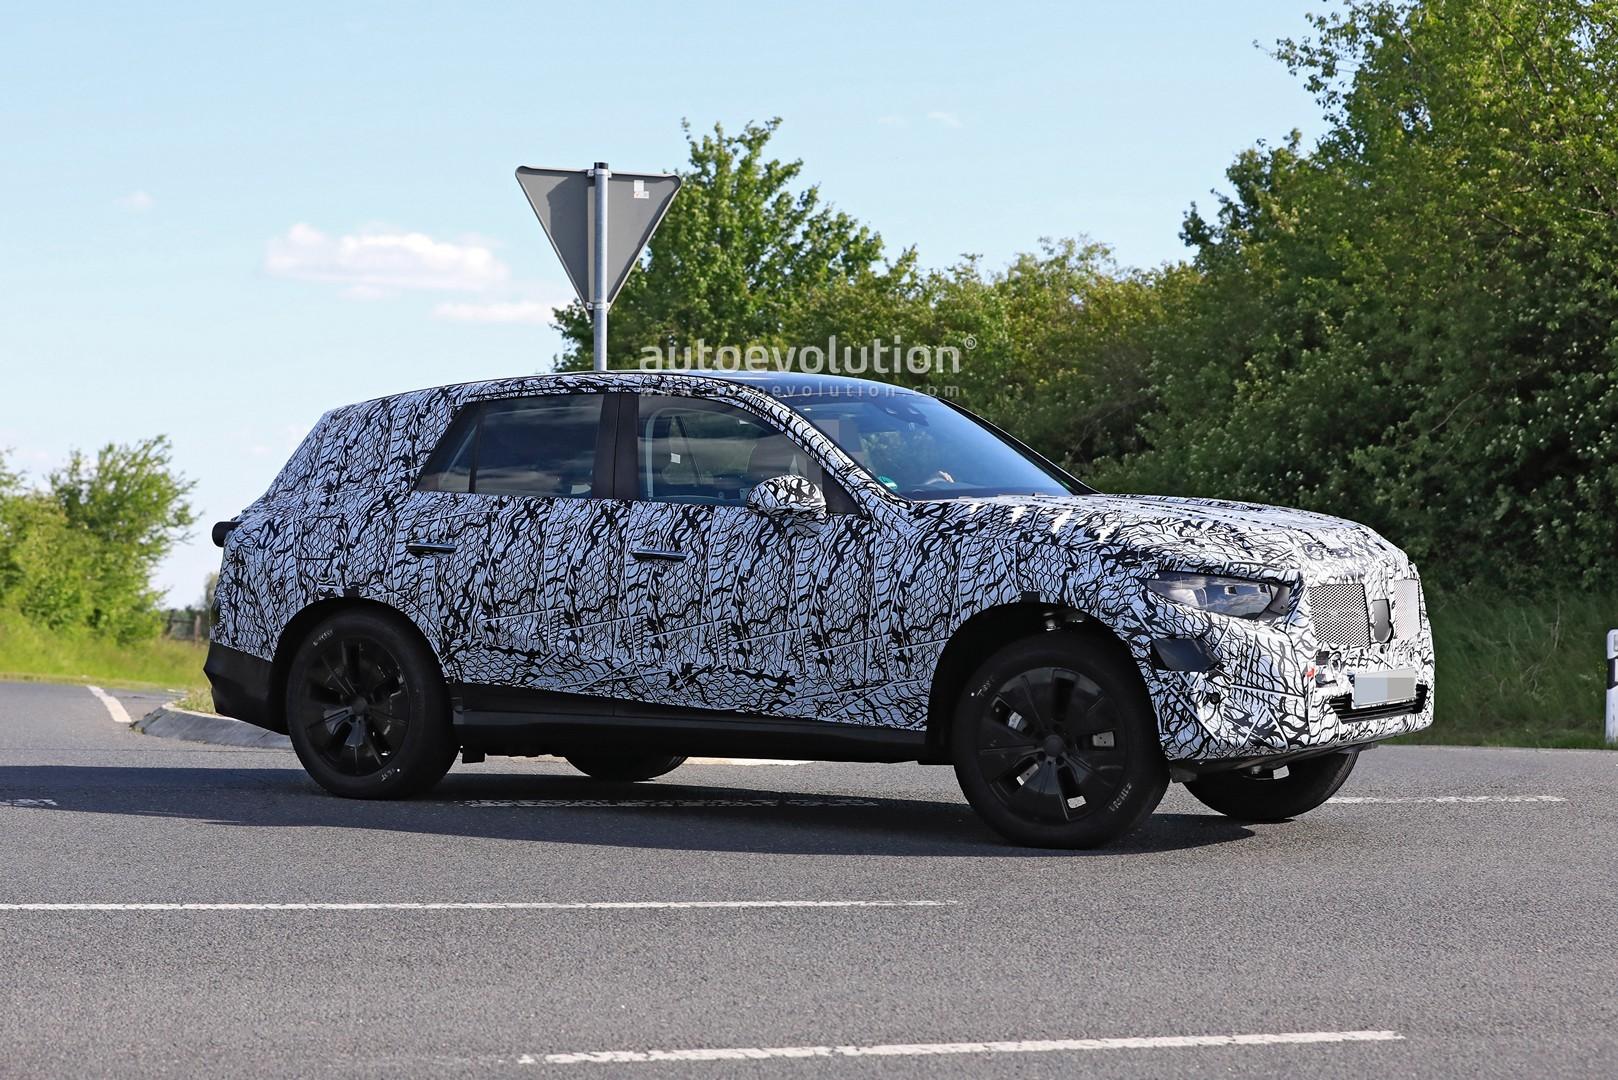 2021 - [Mercedes-Benz] GLC II 2022-mercedes-benz-glc-class-spied-up-close-looks-bigger_7